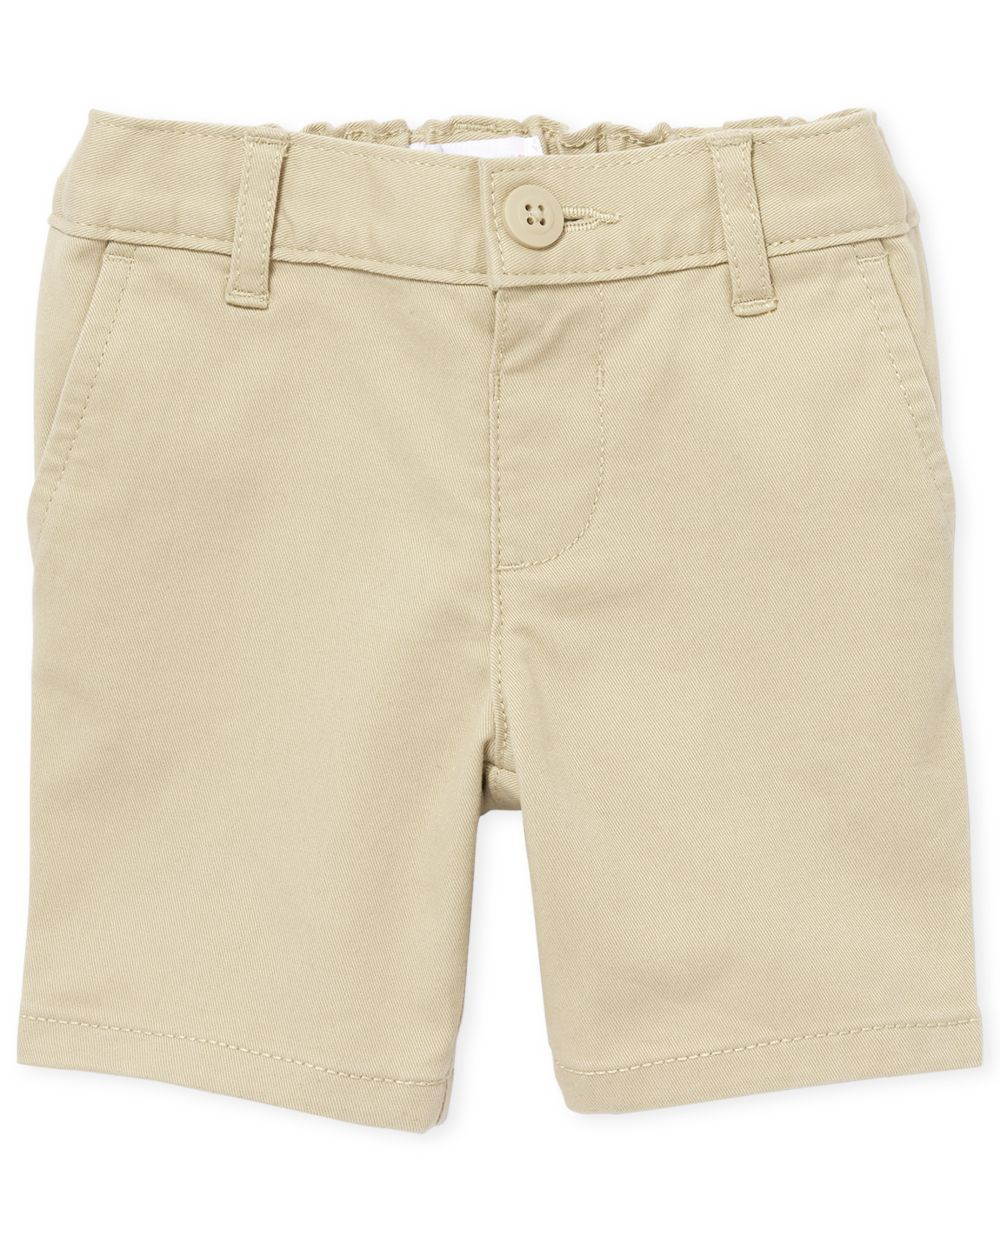 Shorts chinos uniformes para niñas pequeñas